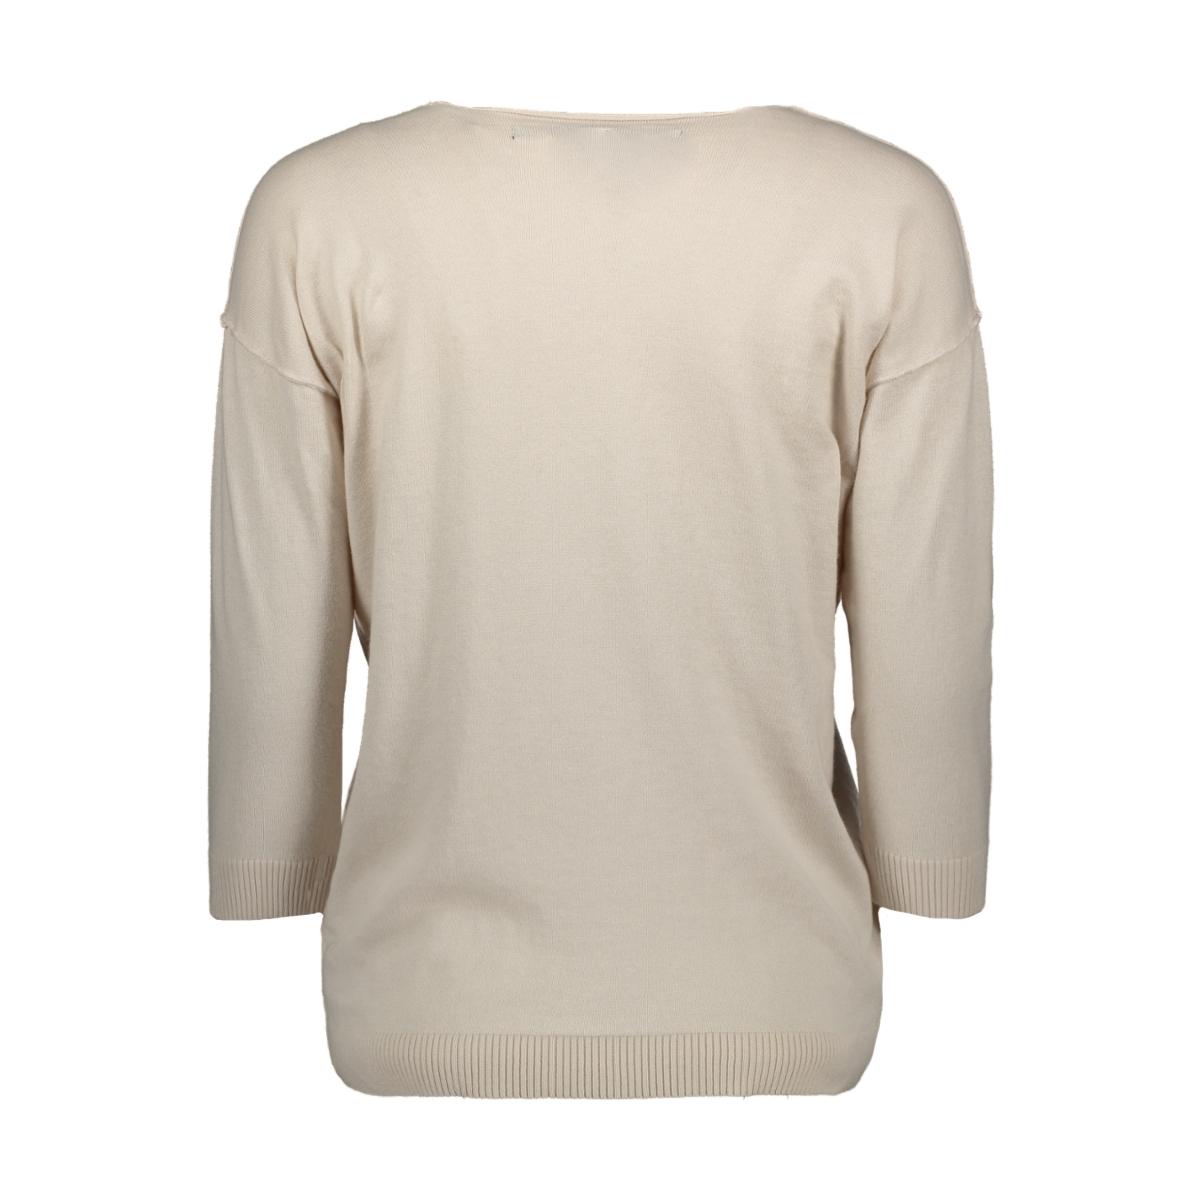 v-neck sweater 20 607 0201 10 days trui 1067 white sand